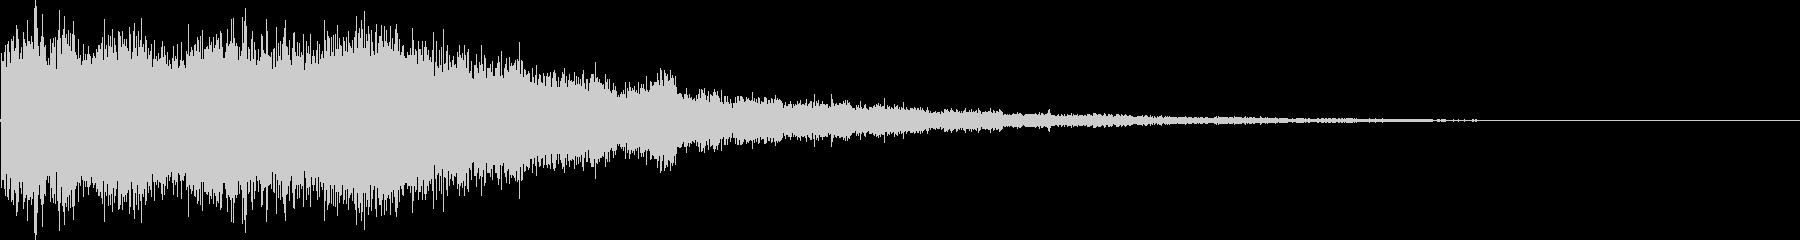 氷魔法03b(冷気属性魔法)の未再生の波形